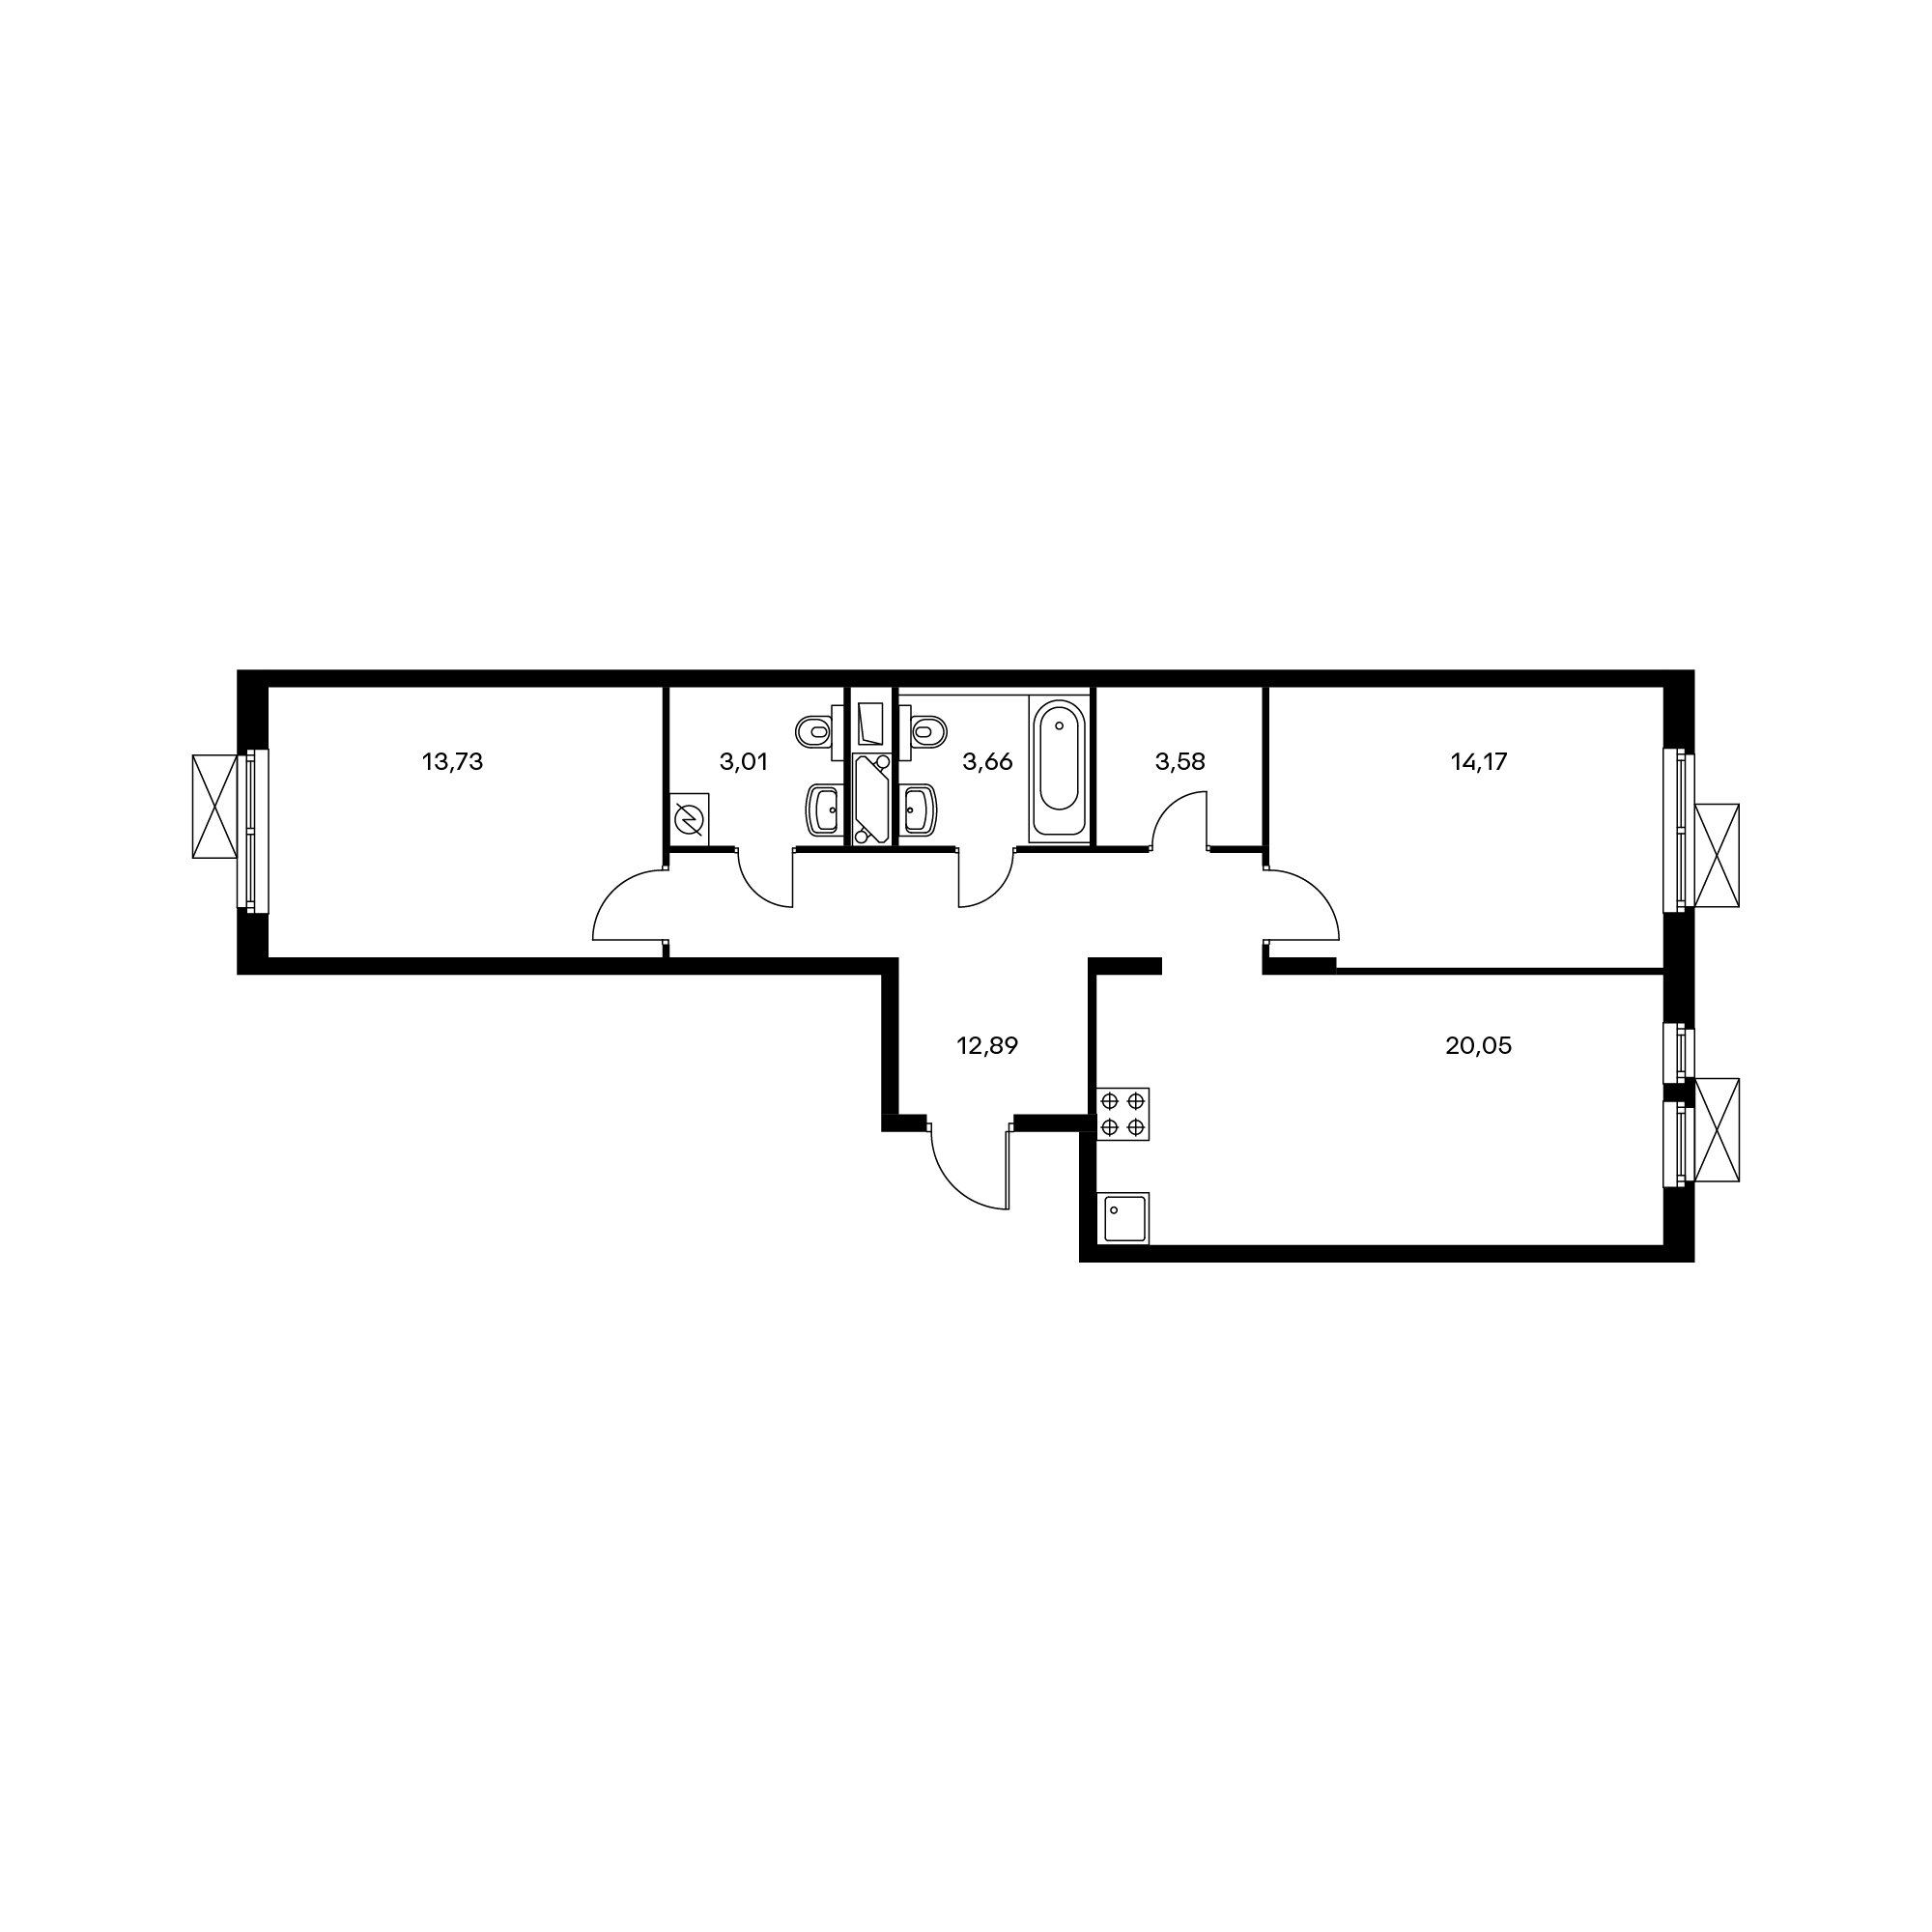 2EL2_6.6